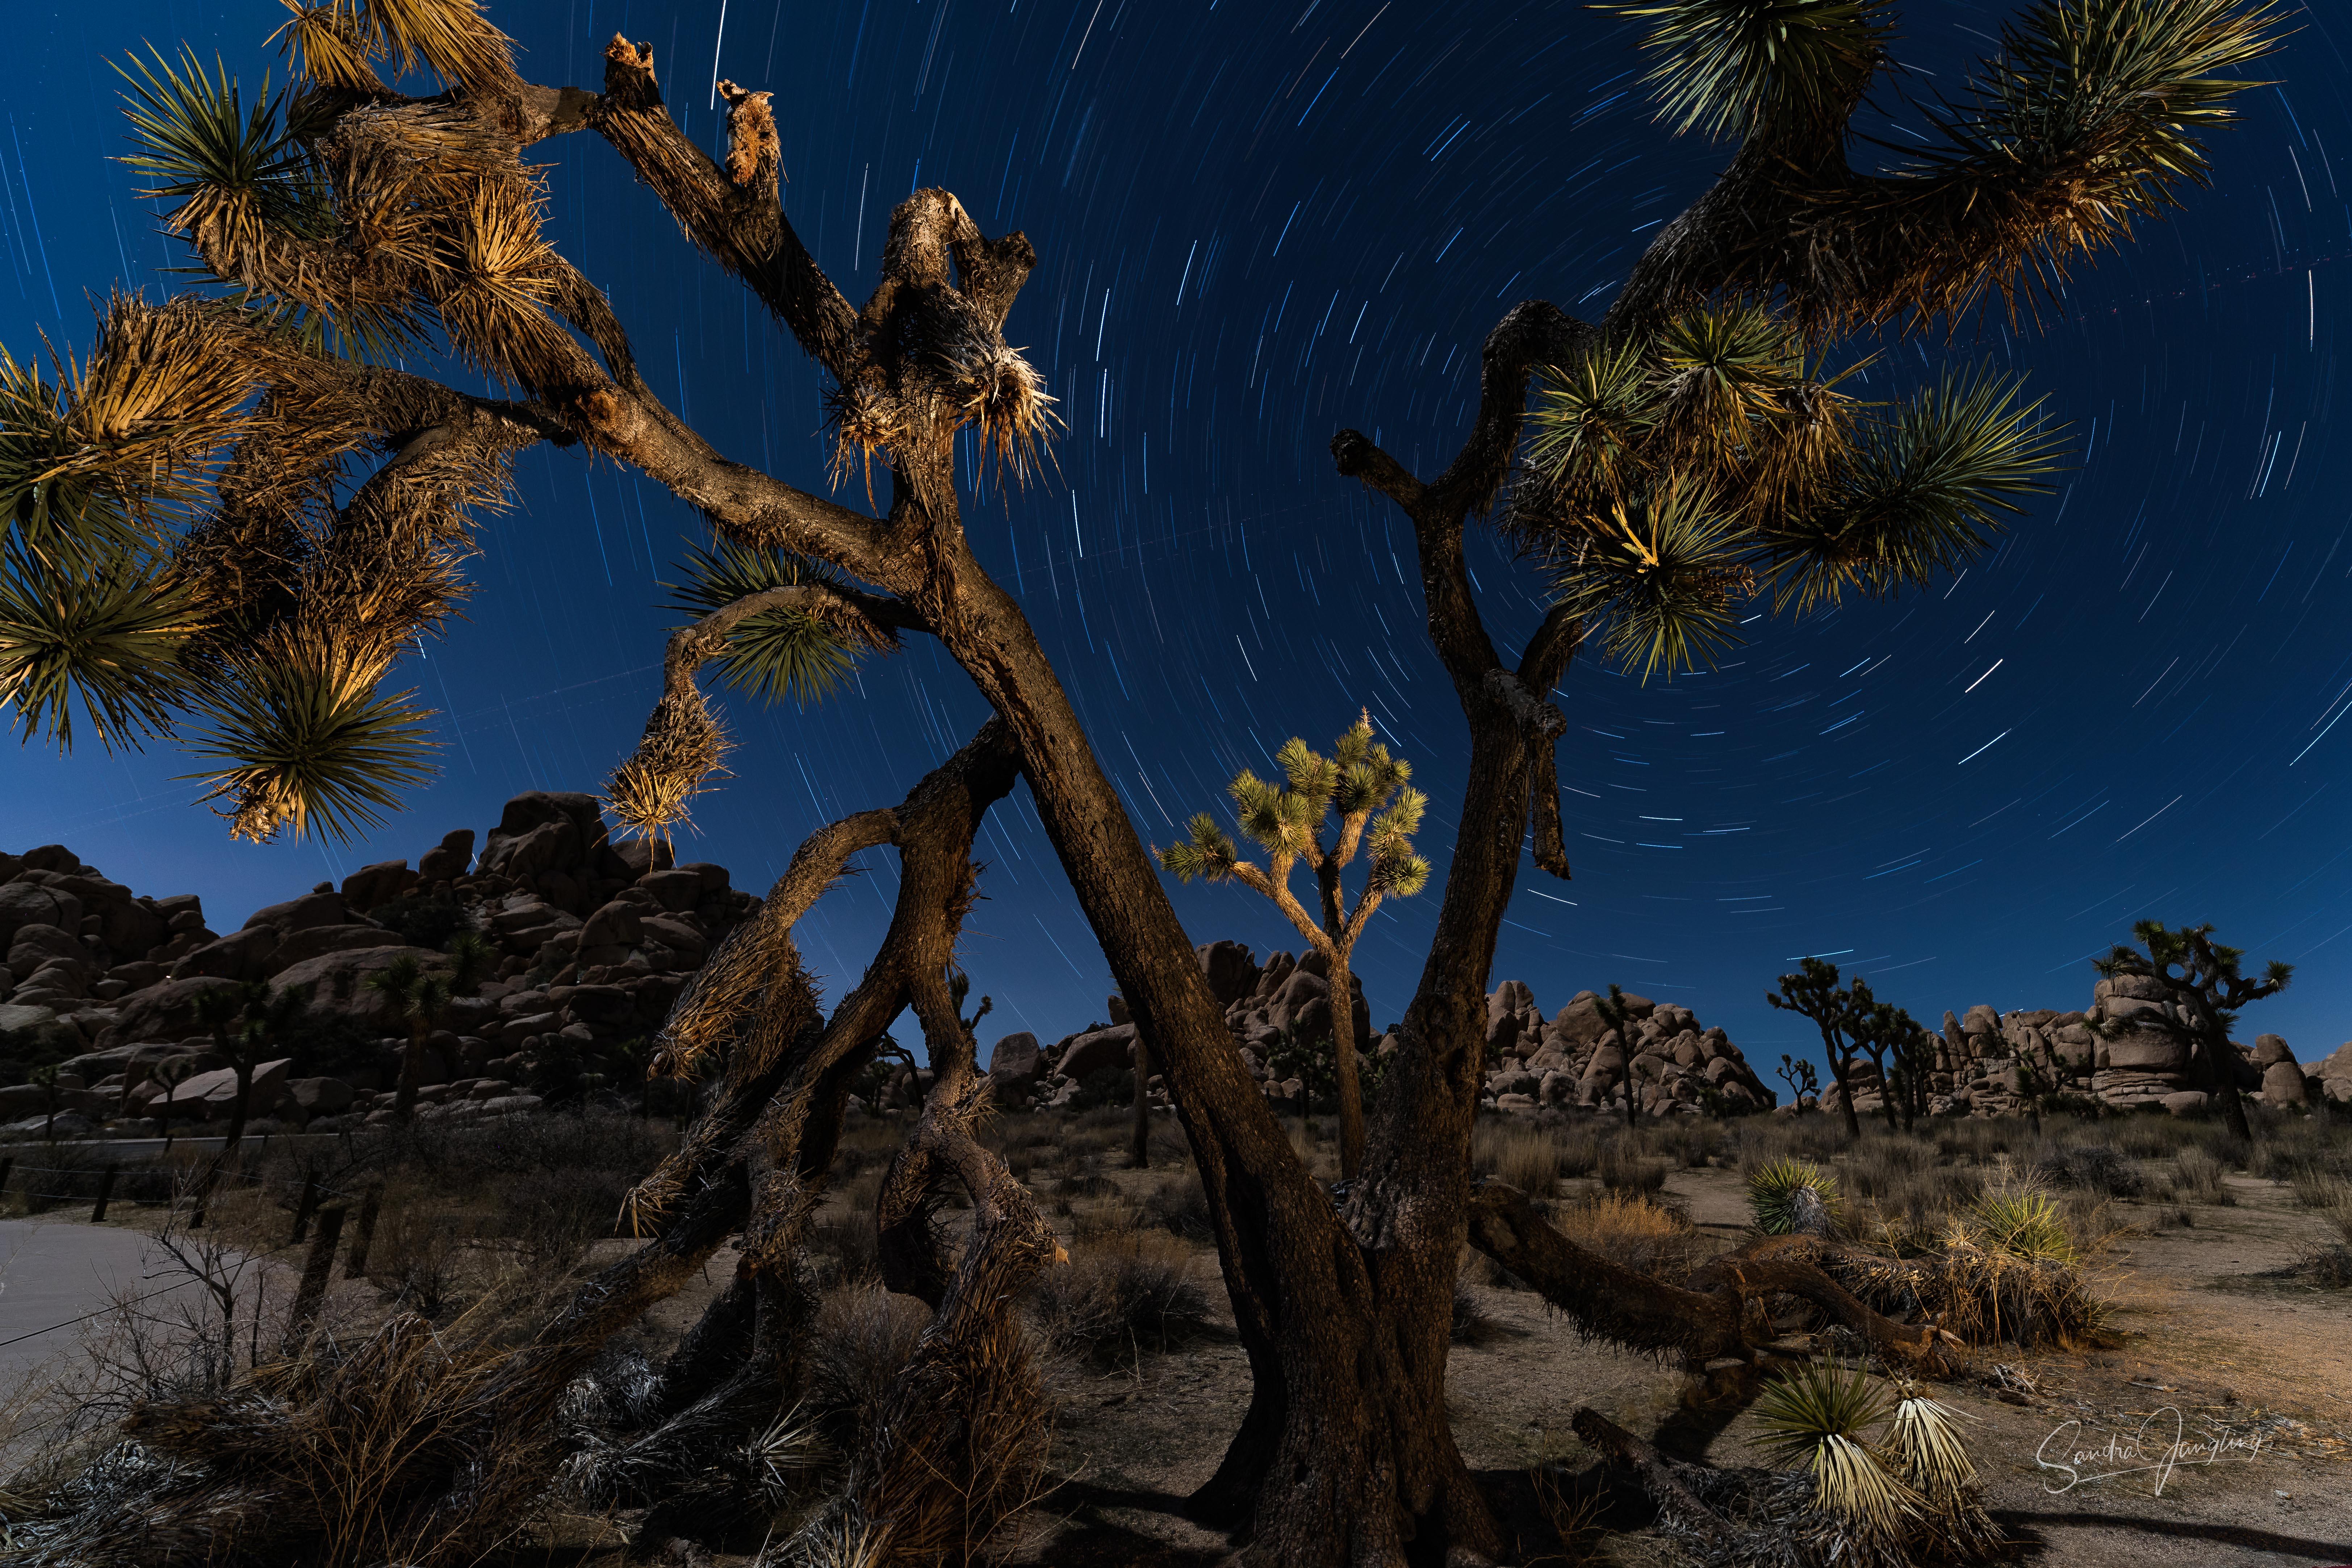 Joshua trees and stars #2